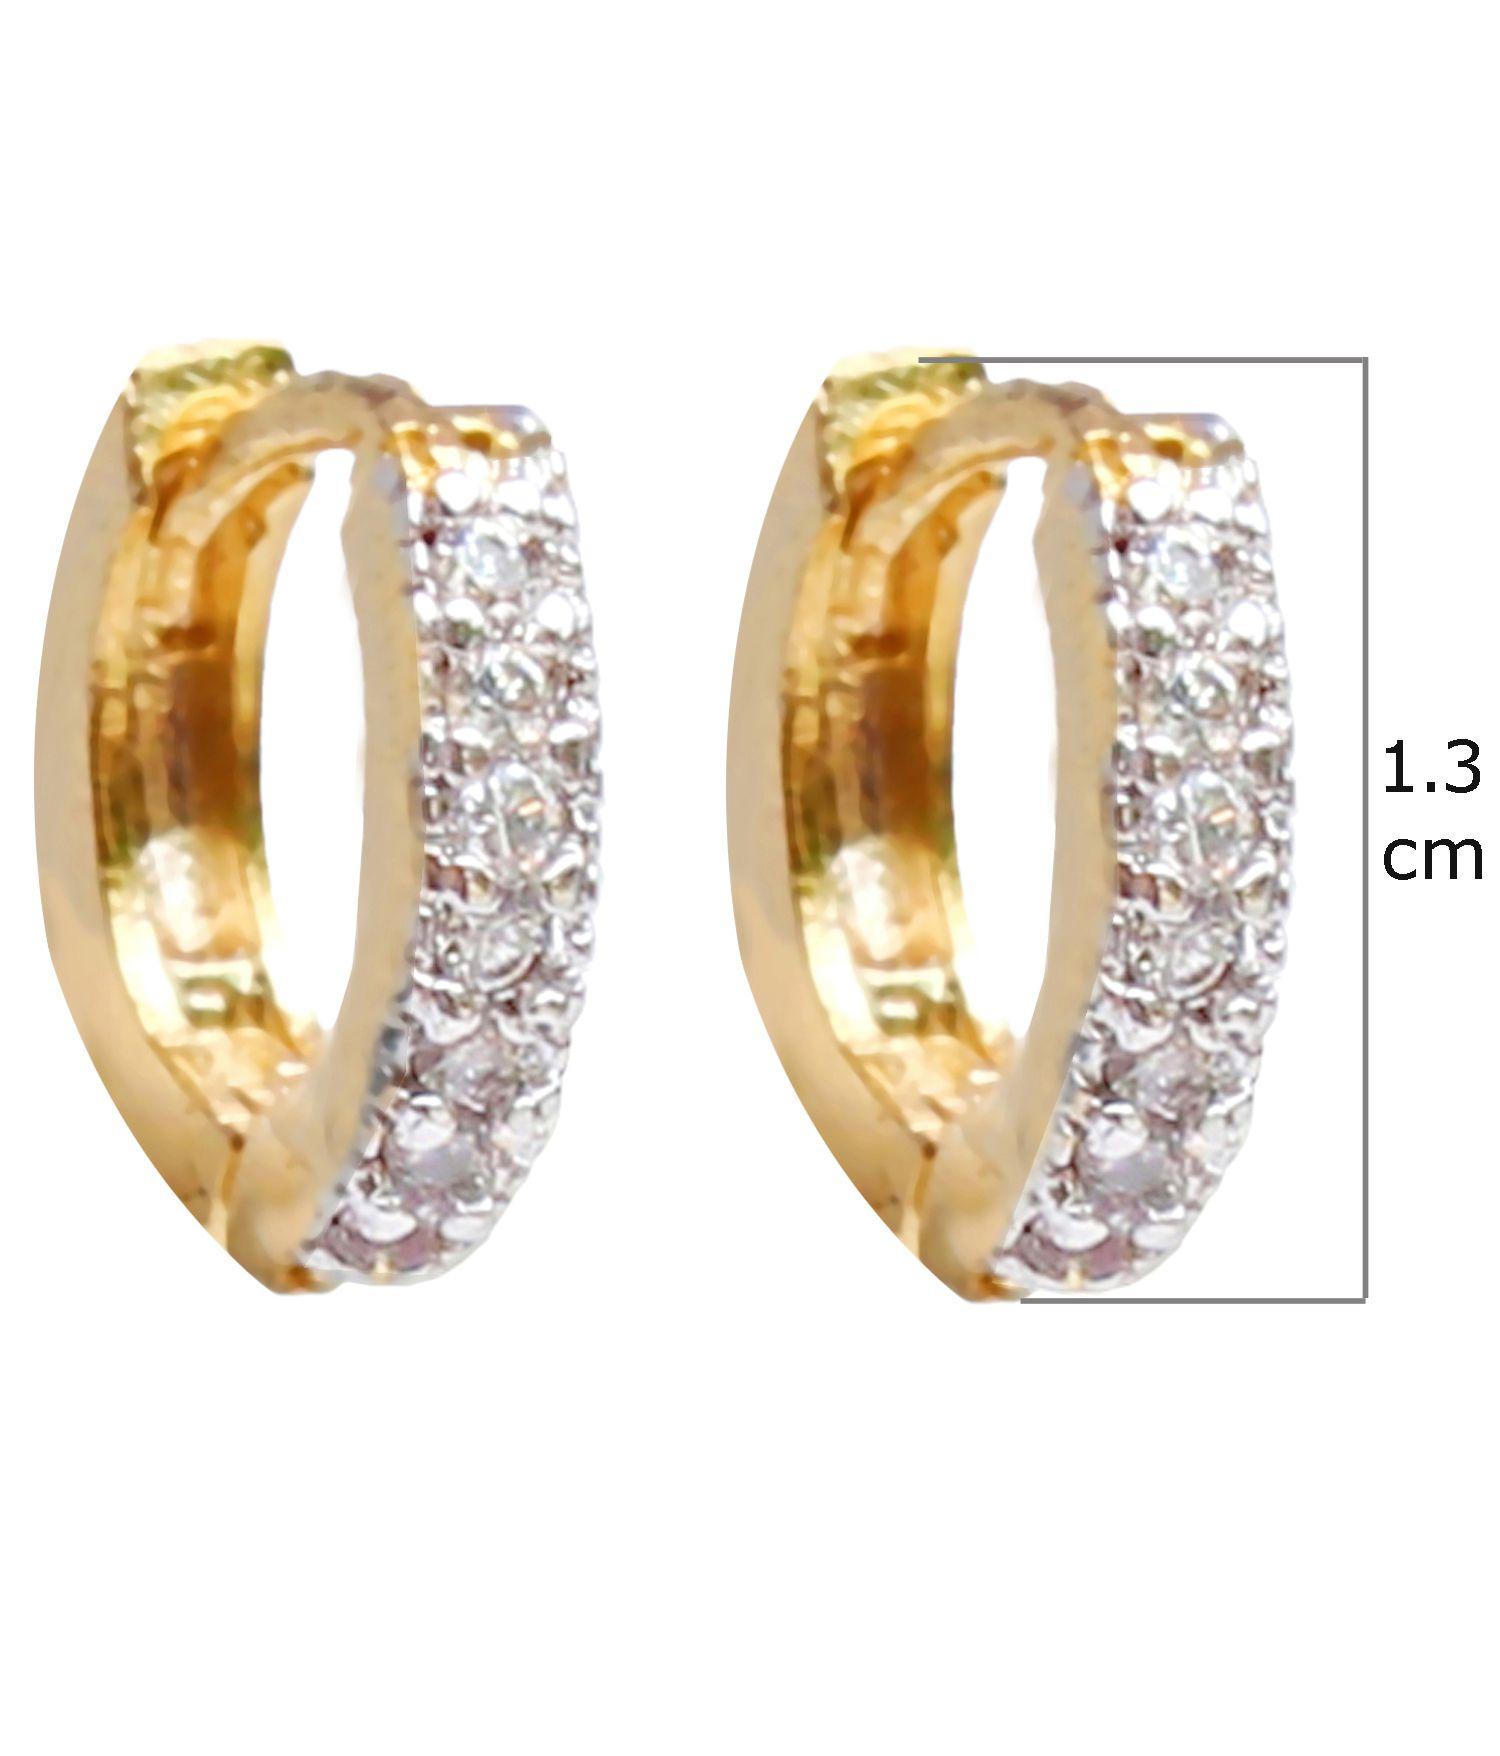 Partywear Designer American Diamond Bali & Hanging Earring Buy